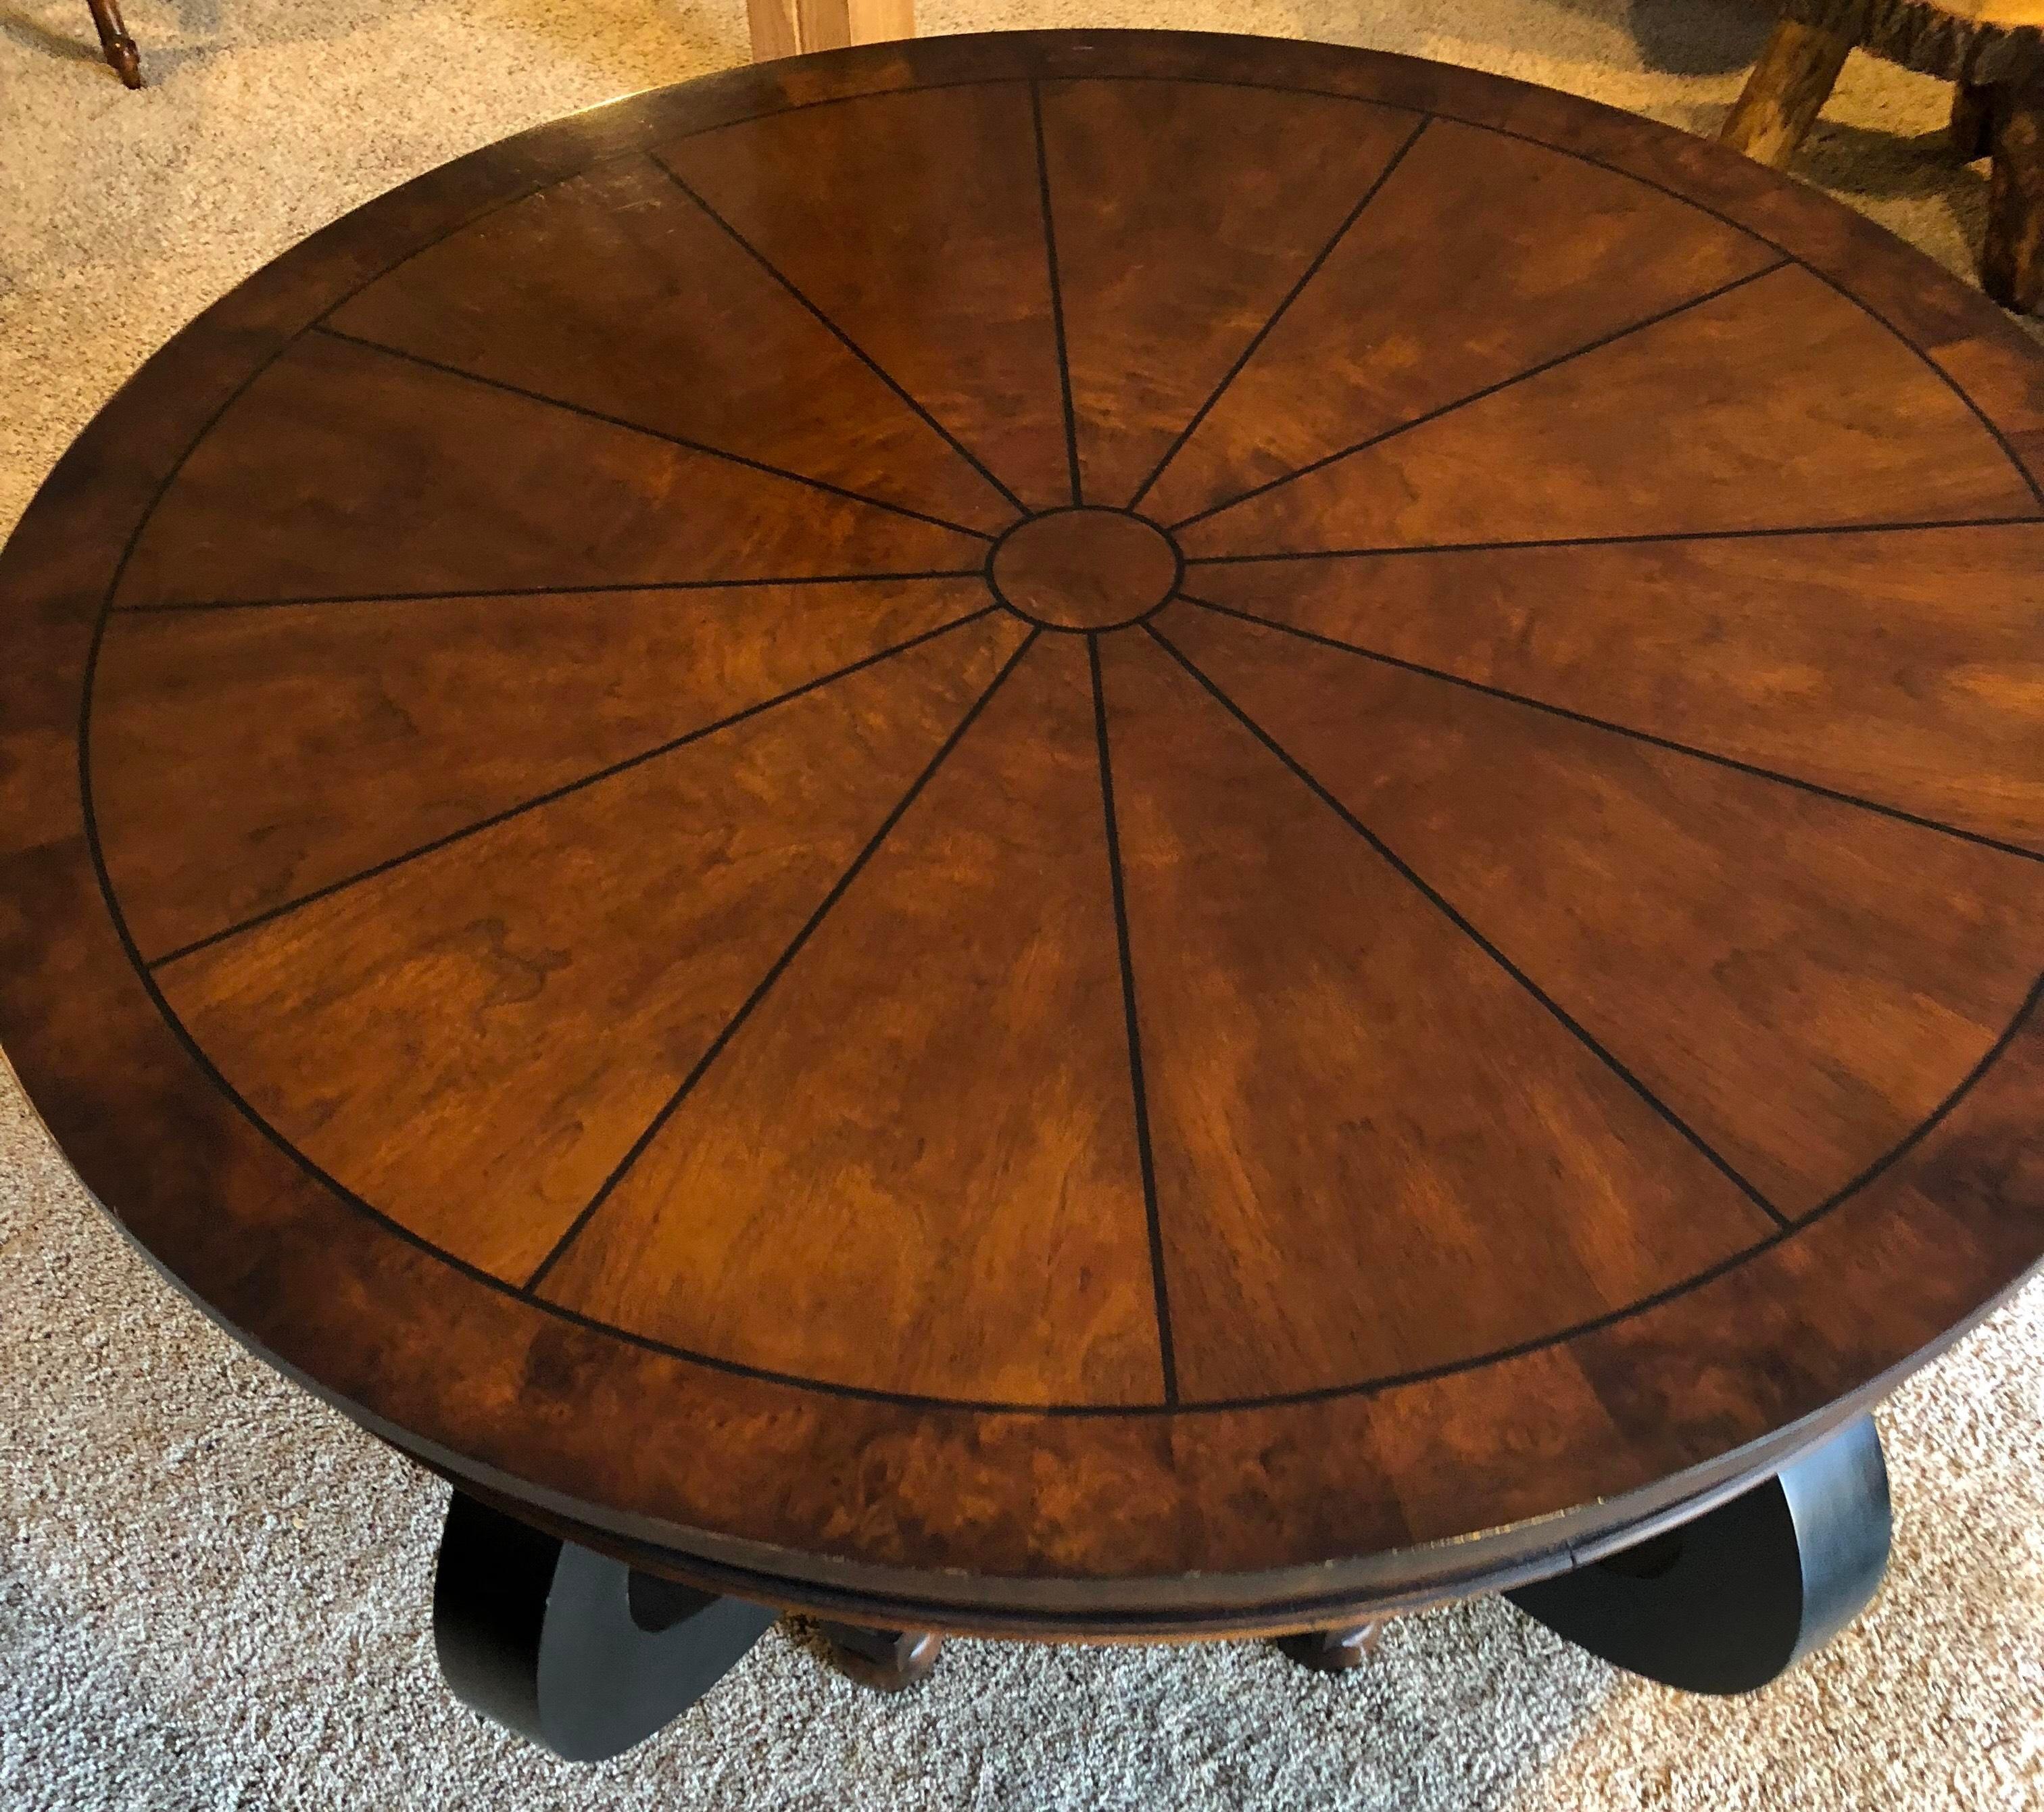 Henredon Henredon Dining Table For Sale   Image 4 Of 5